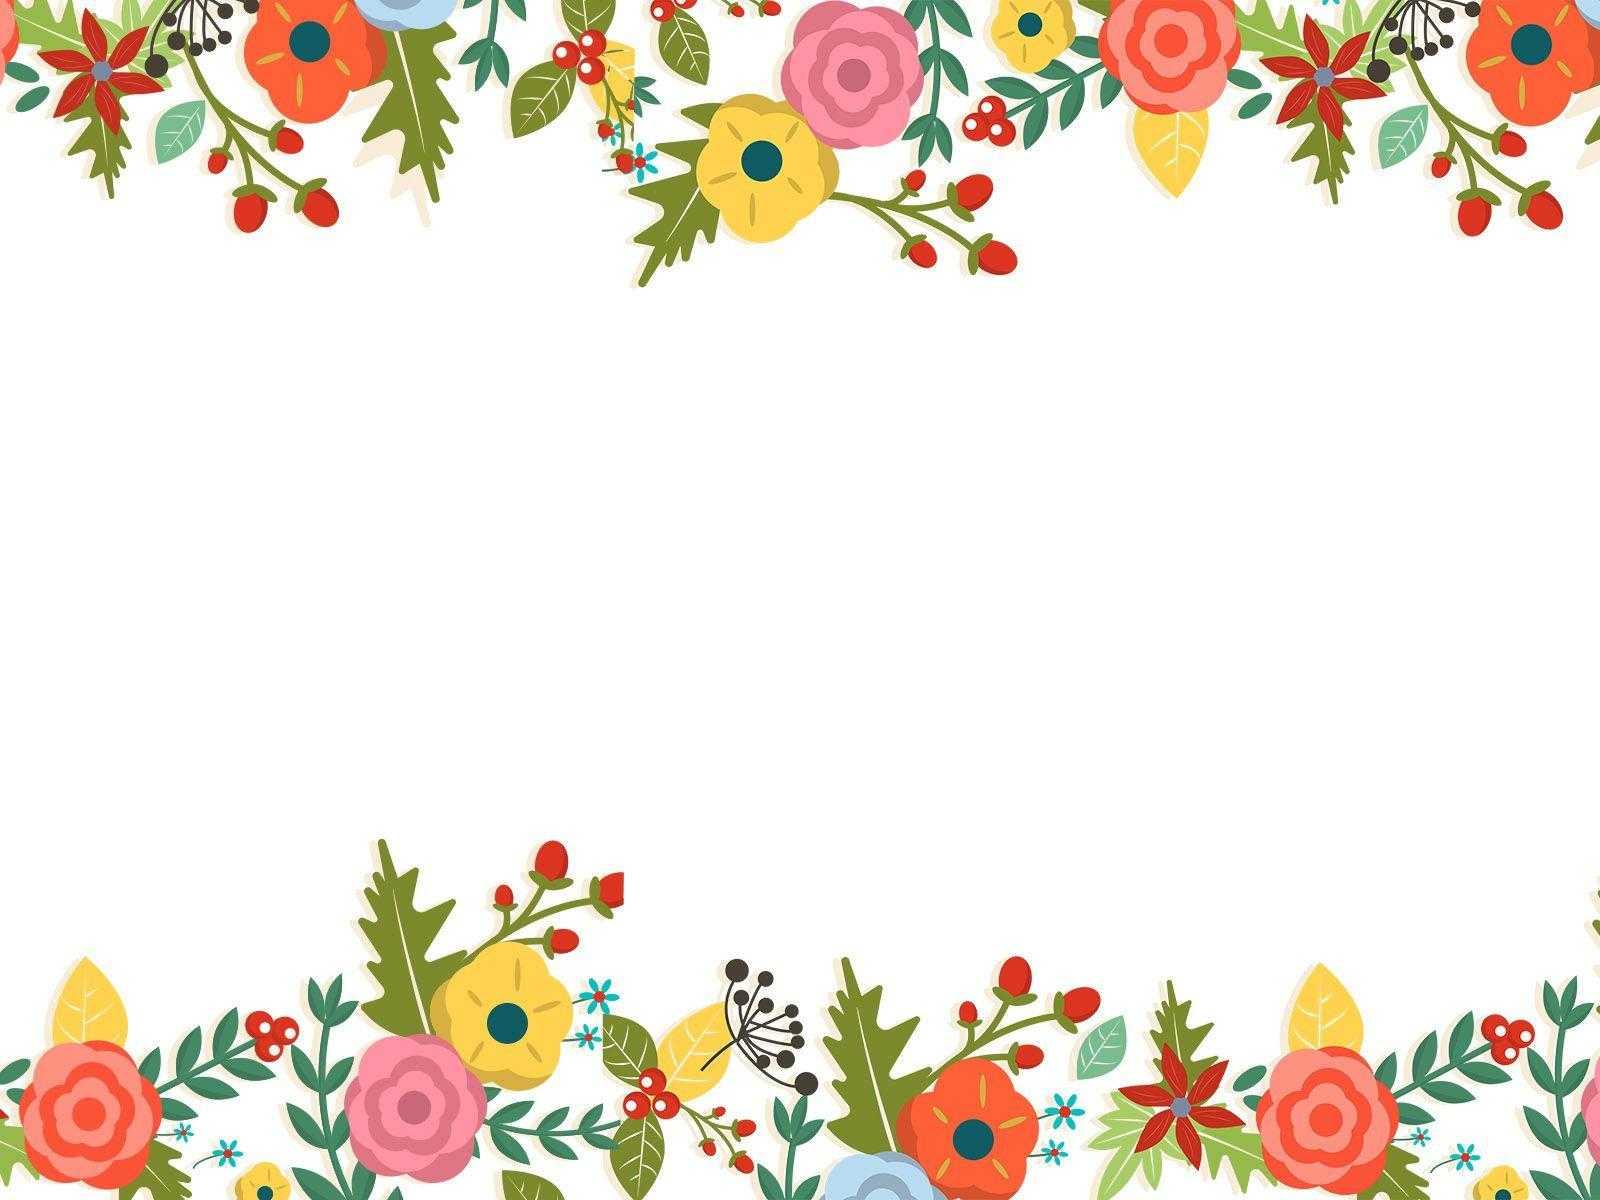 Wallpapers Powerpoint Cute - Wallpaper Cave Regarding Pretty Powerpoint Templates